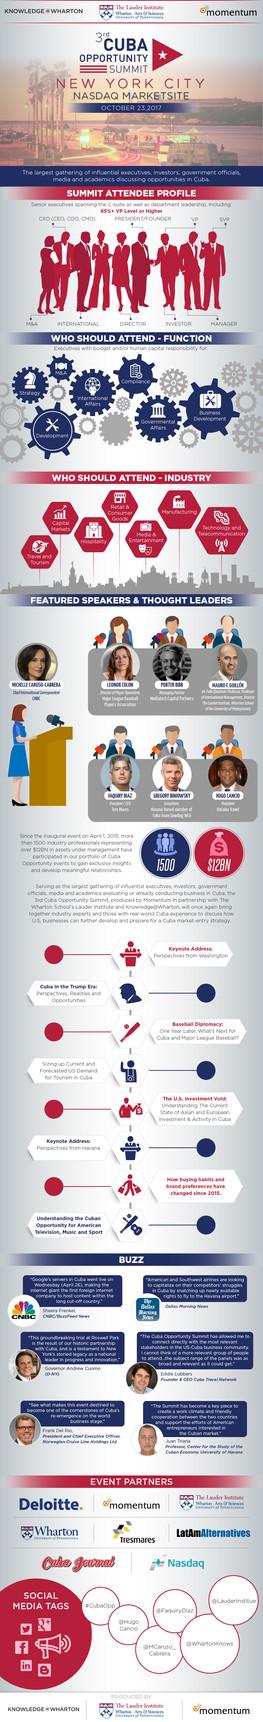 3rd Cuba Opportunity Summit